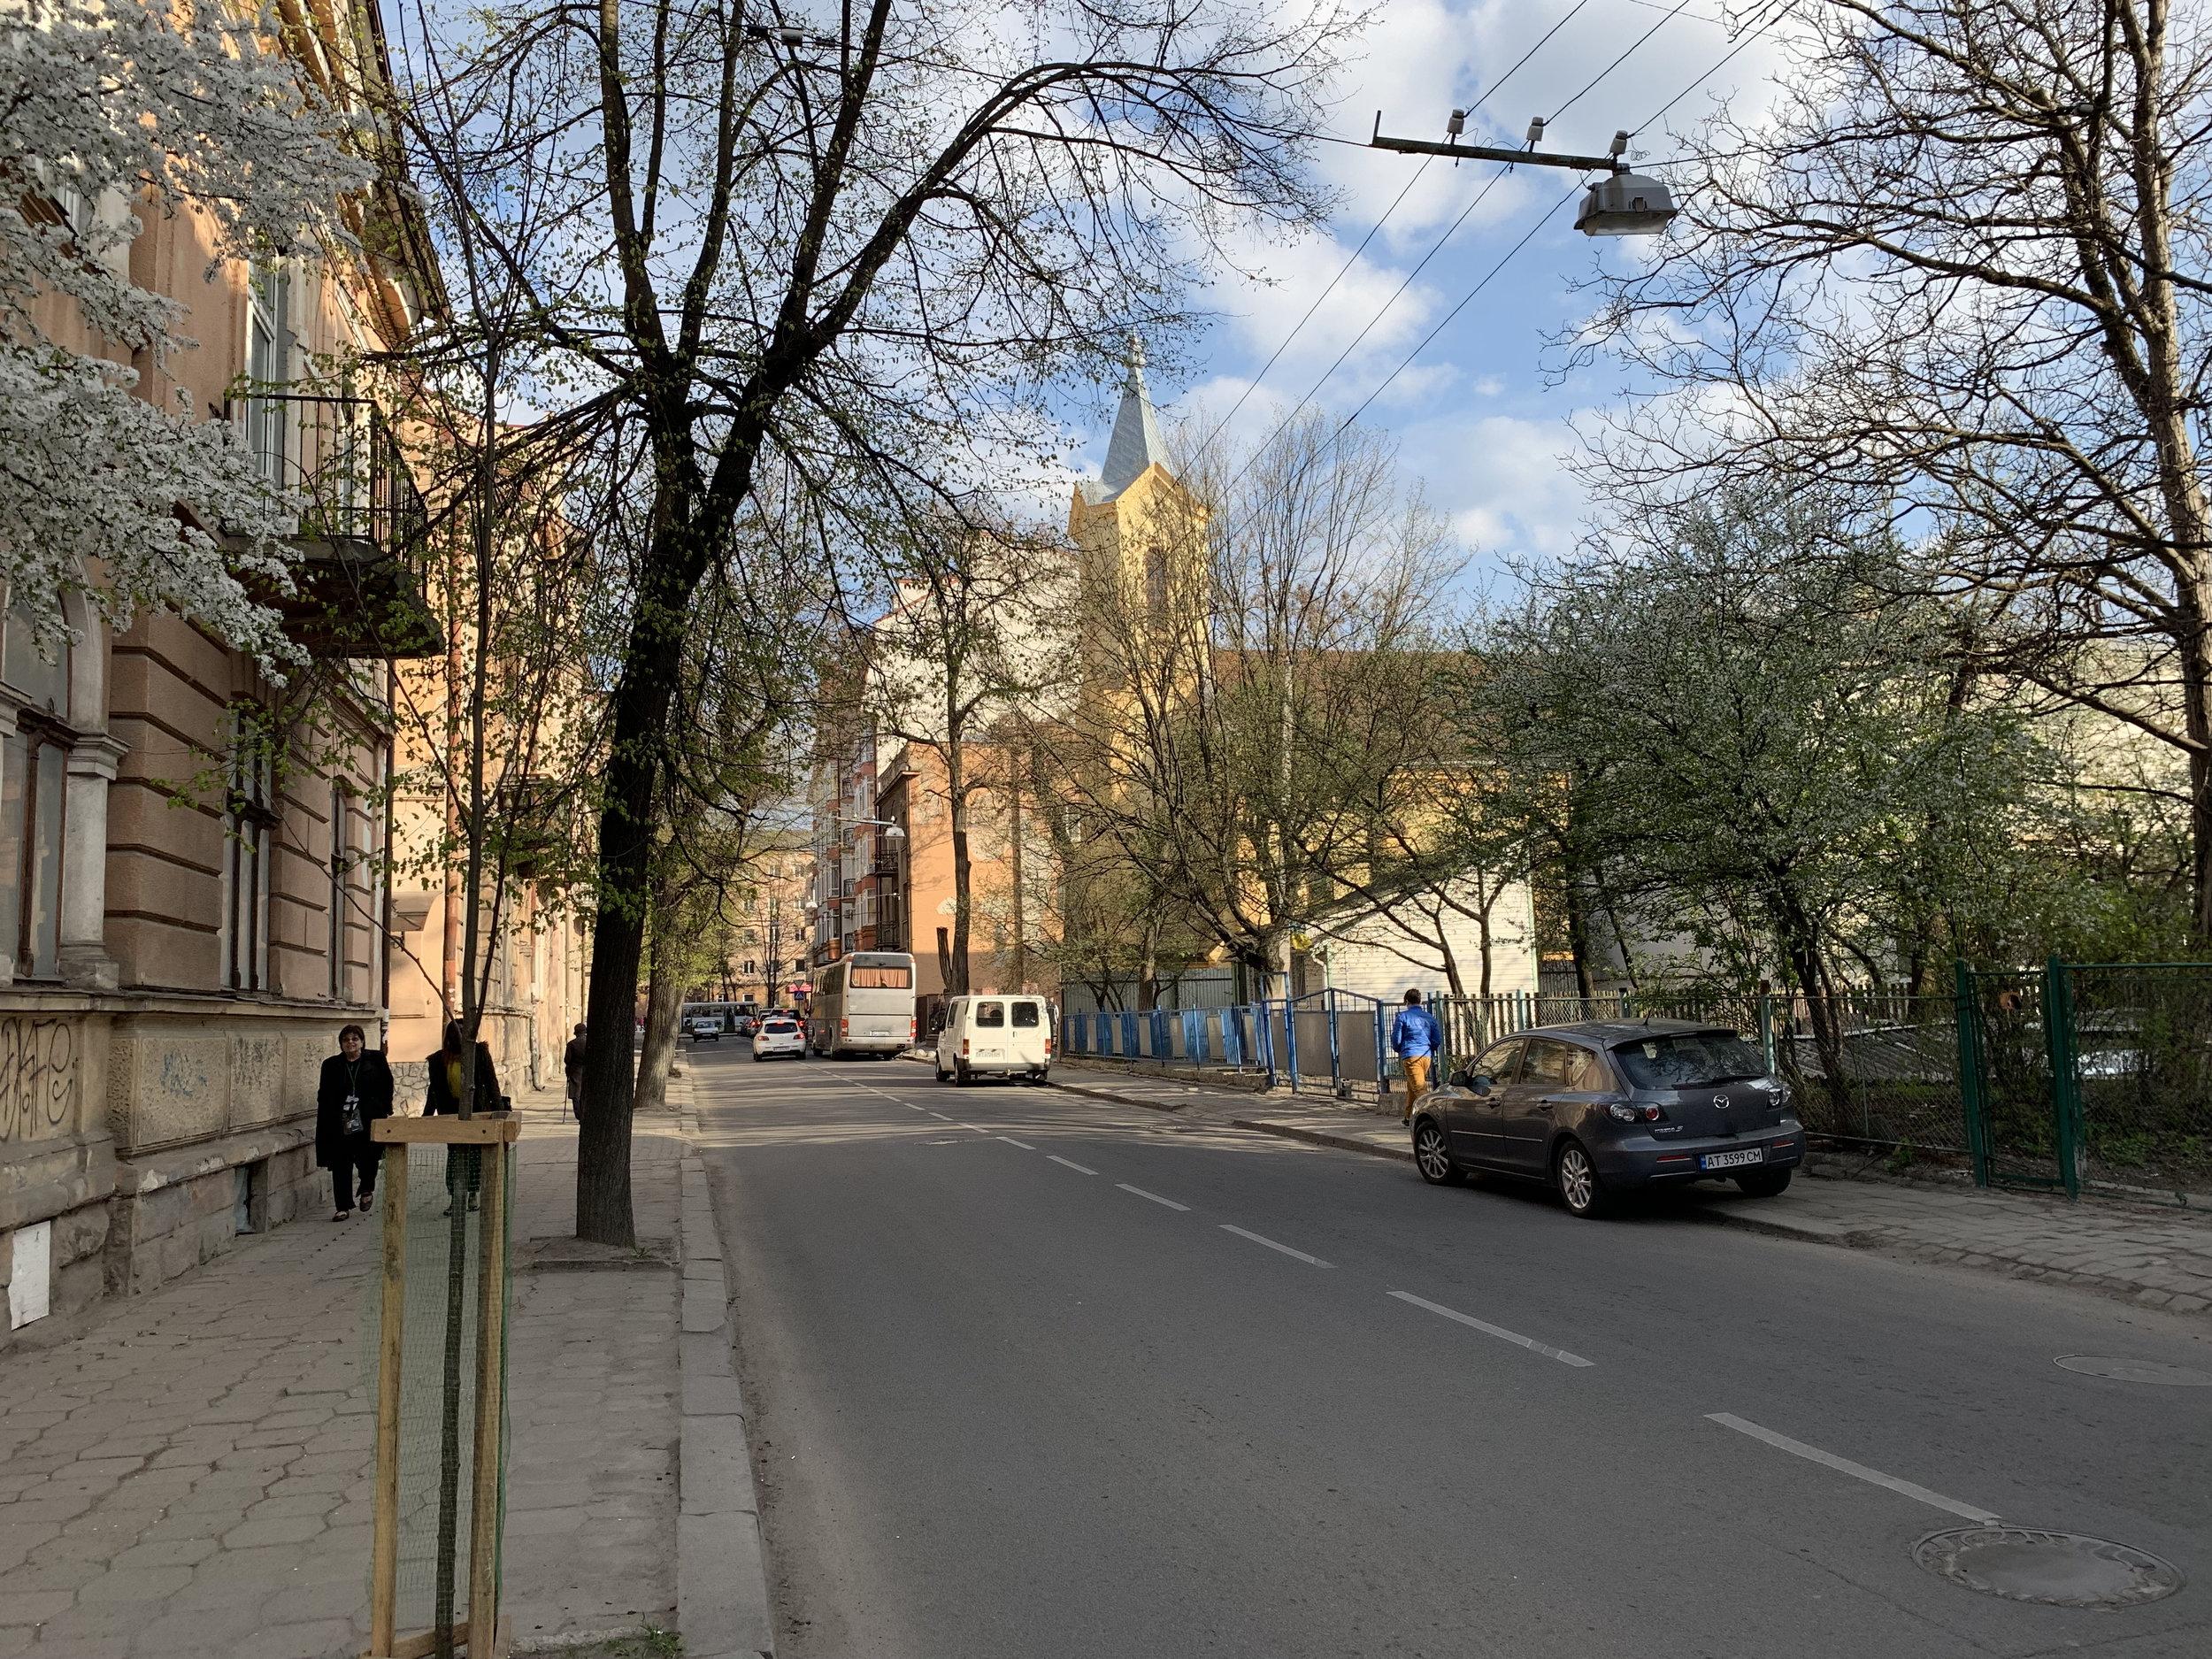 The beautiful city of Ivano-Frankisvk.